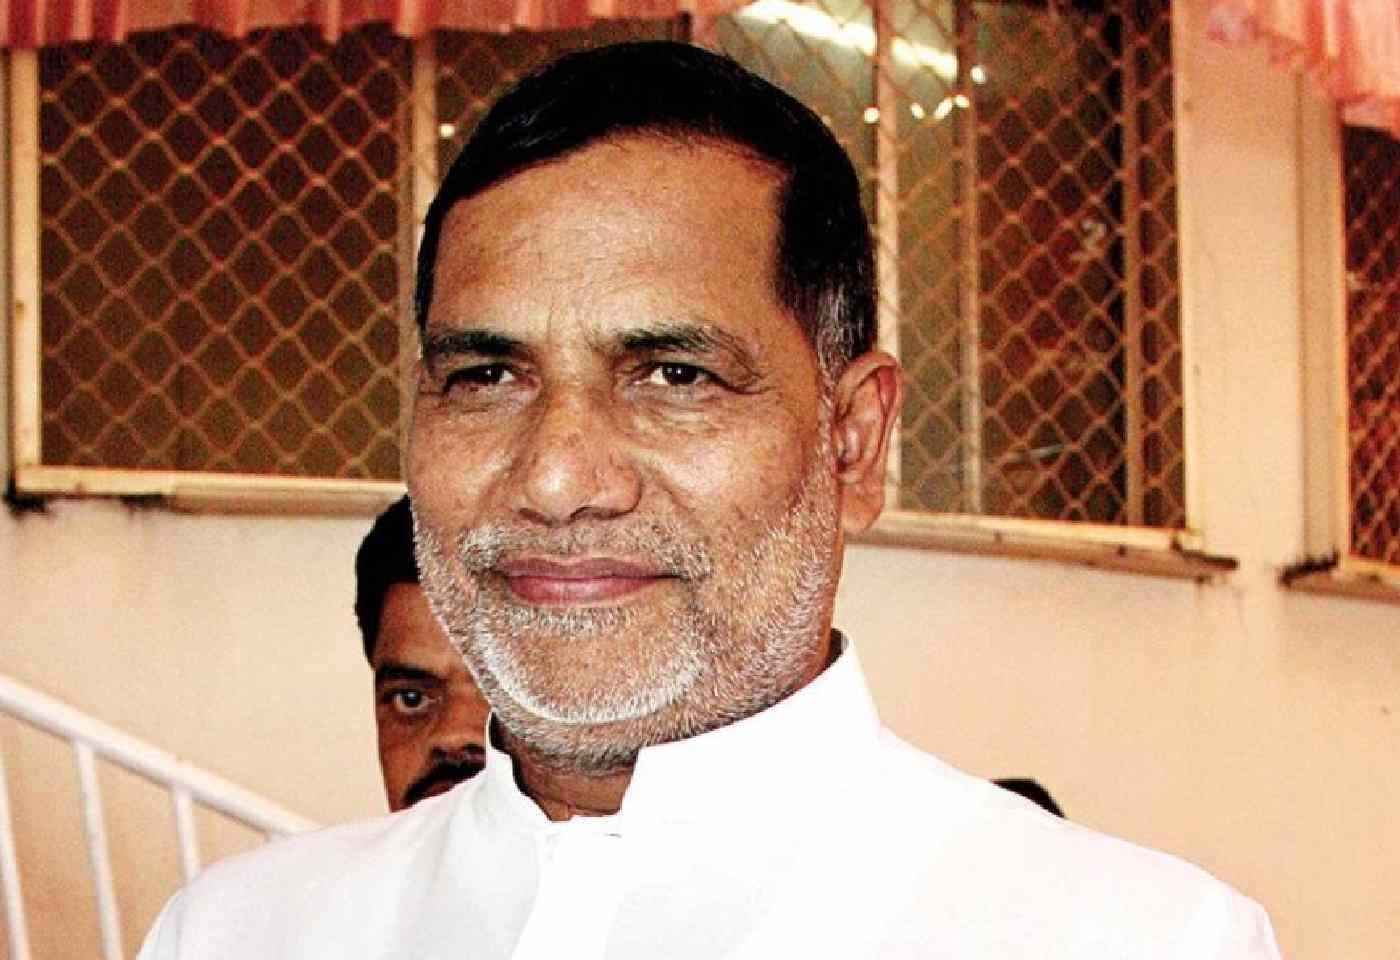 Ex Minister Congress Leader Kripashankar Singh Joining BJP Tomorrow Ahead Of BMC Elections